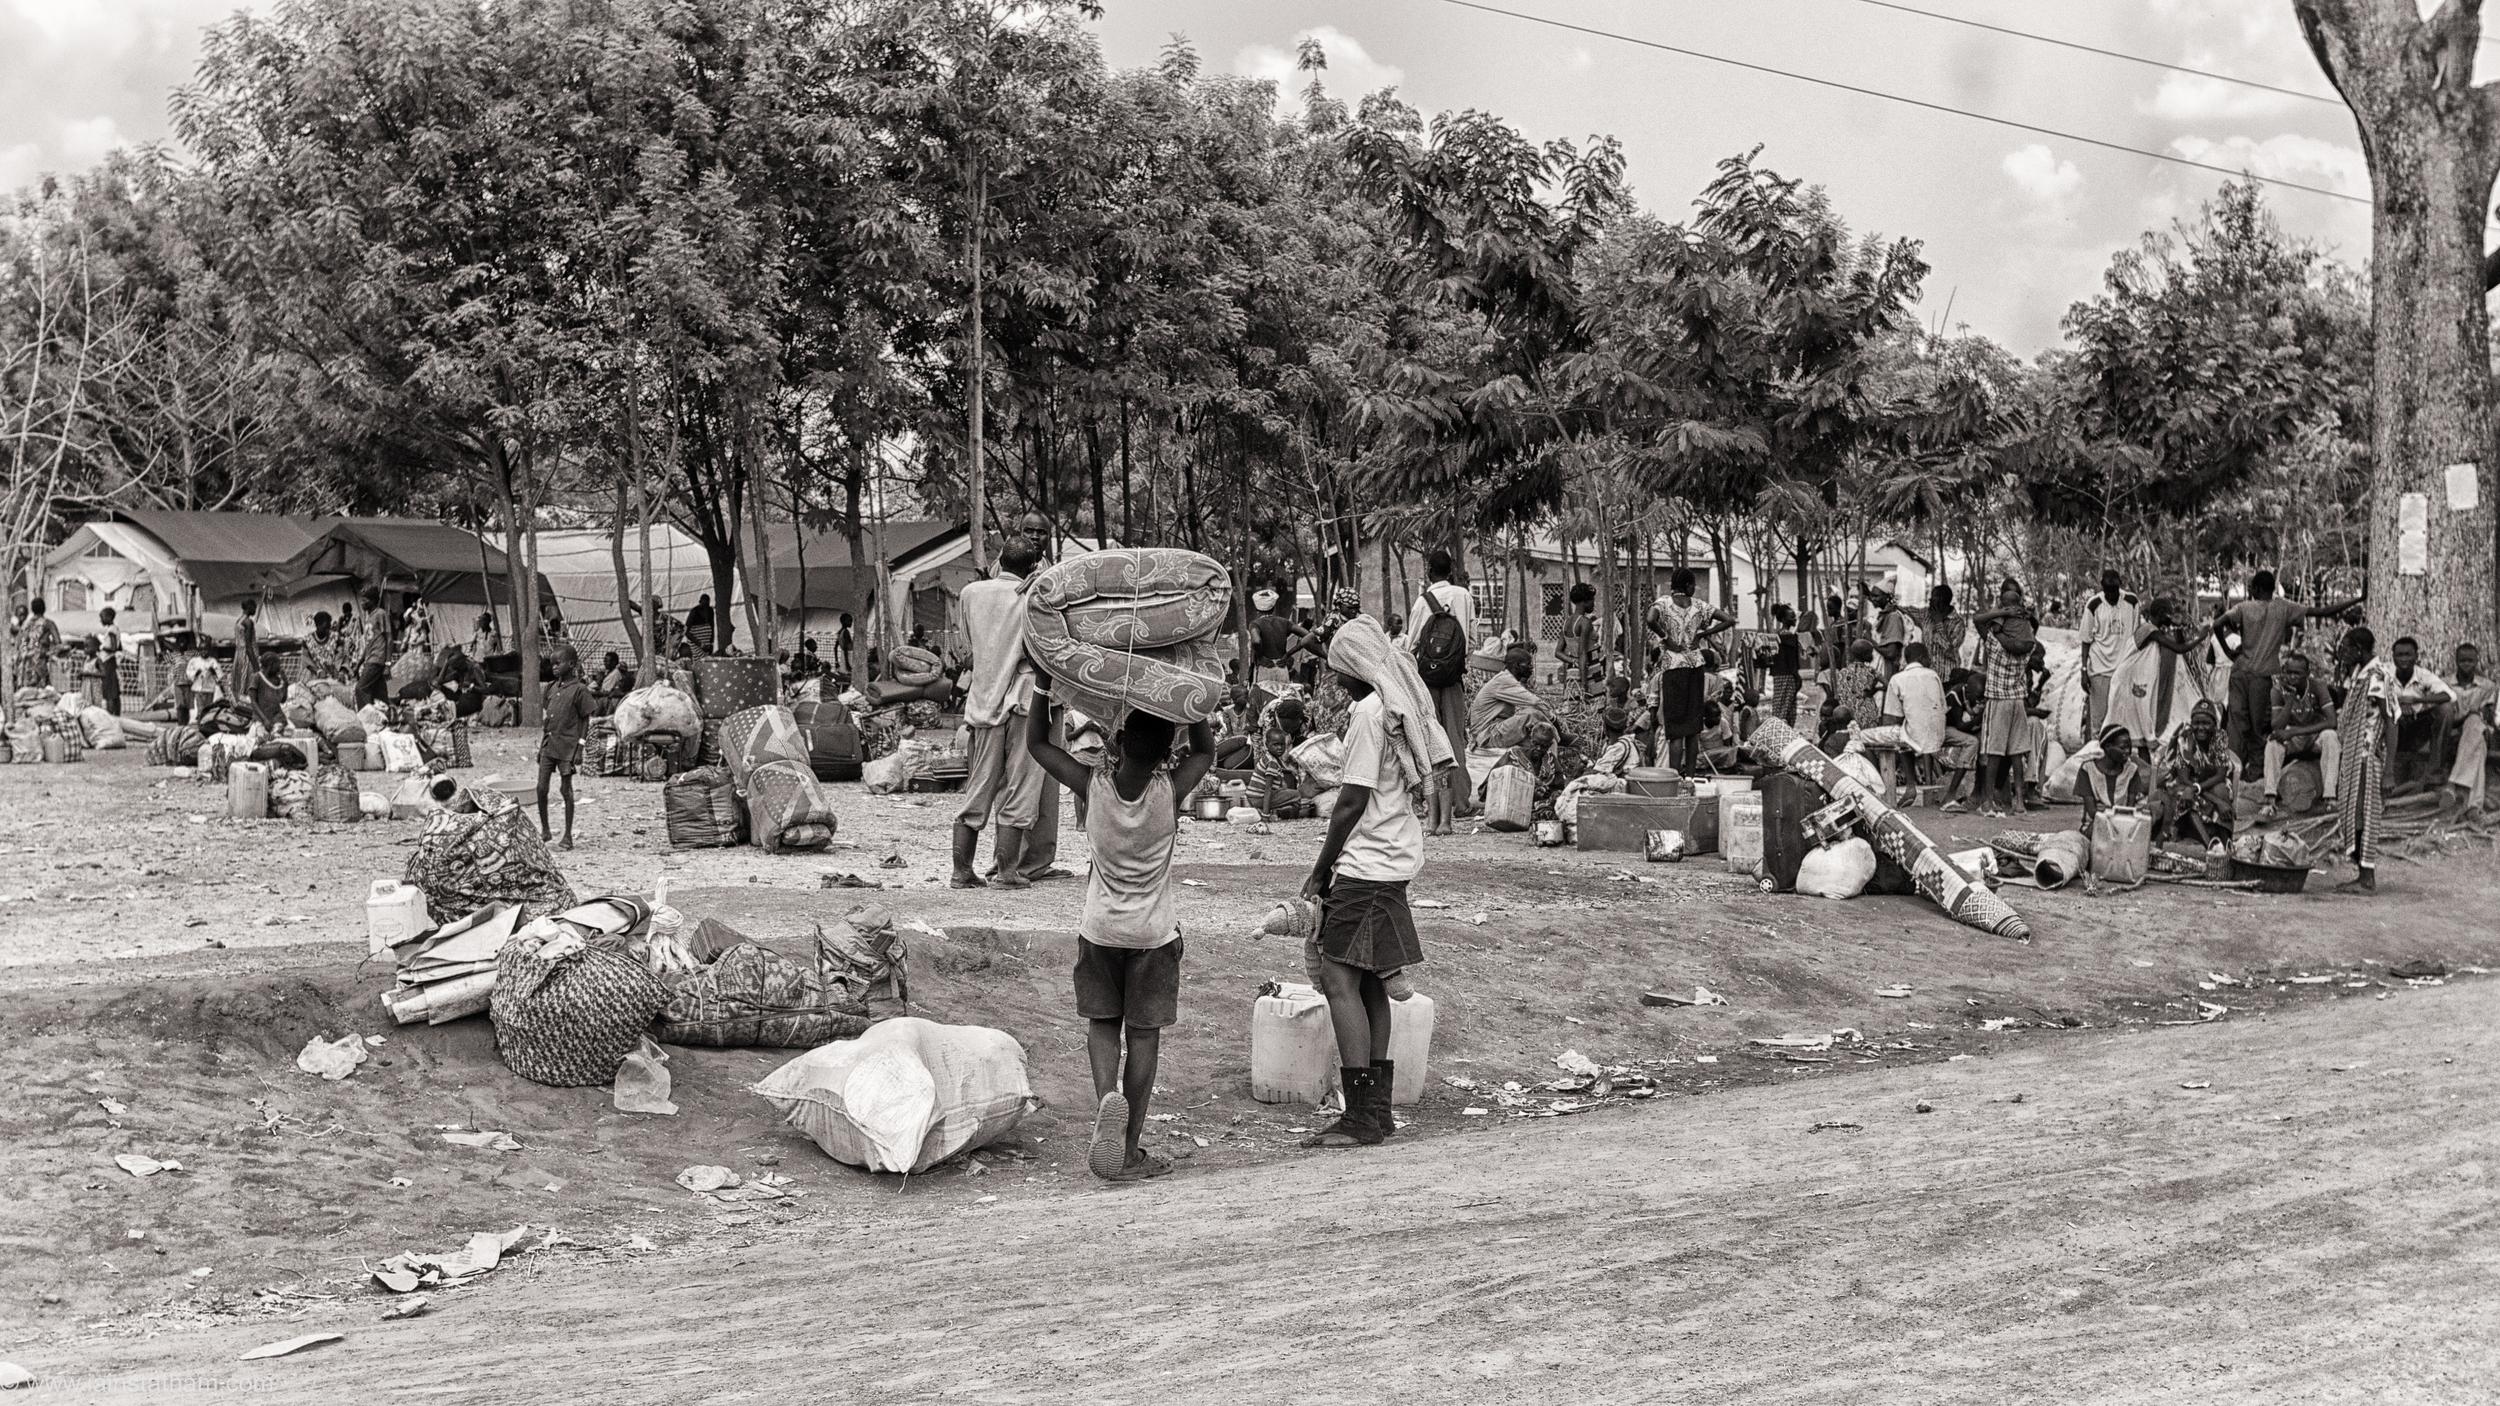 ug - south sudan refugees - dziapi - bw-3.jpg